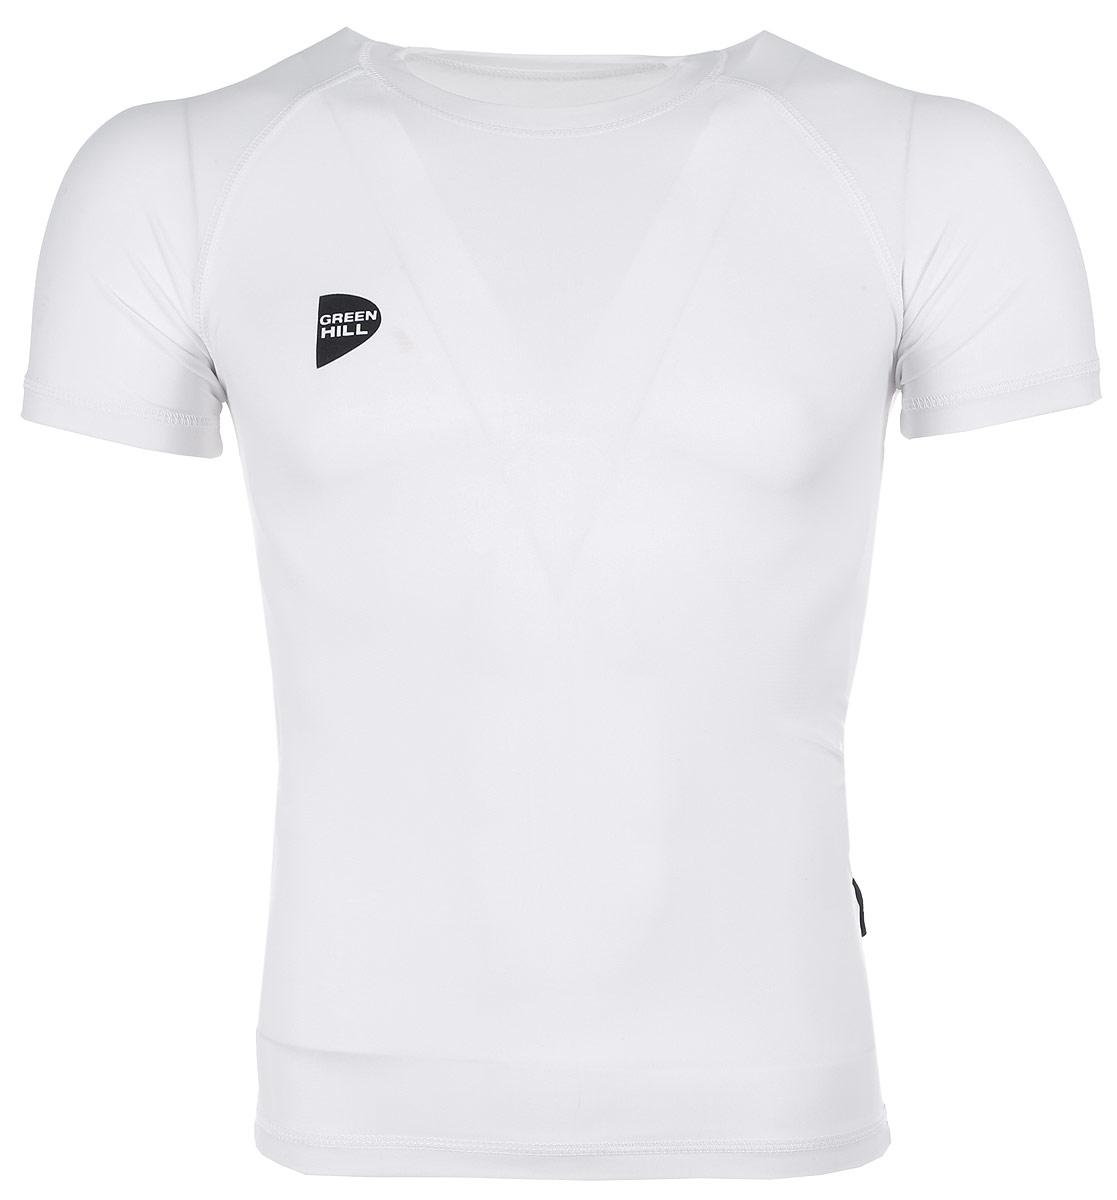 Защитная футболка Green Hill, цвет: белый. Размер XXL. RGS-3558УТ-00009144Защитная футболка с логотипом дзюдо. Материал: полиэстер/лайкра. Размеры: Длина 74 см ширина 47 см